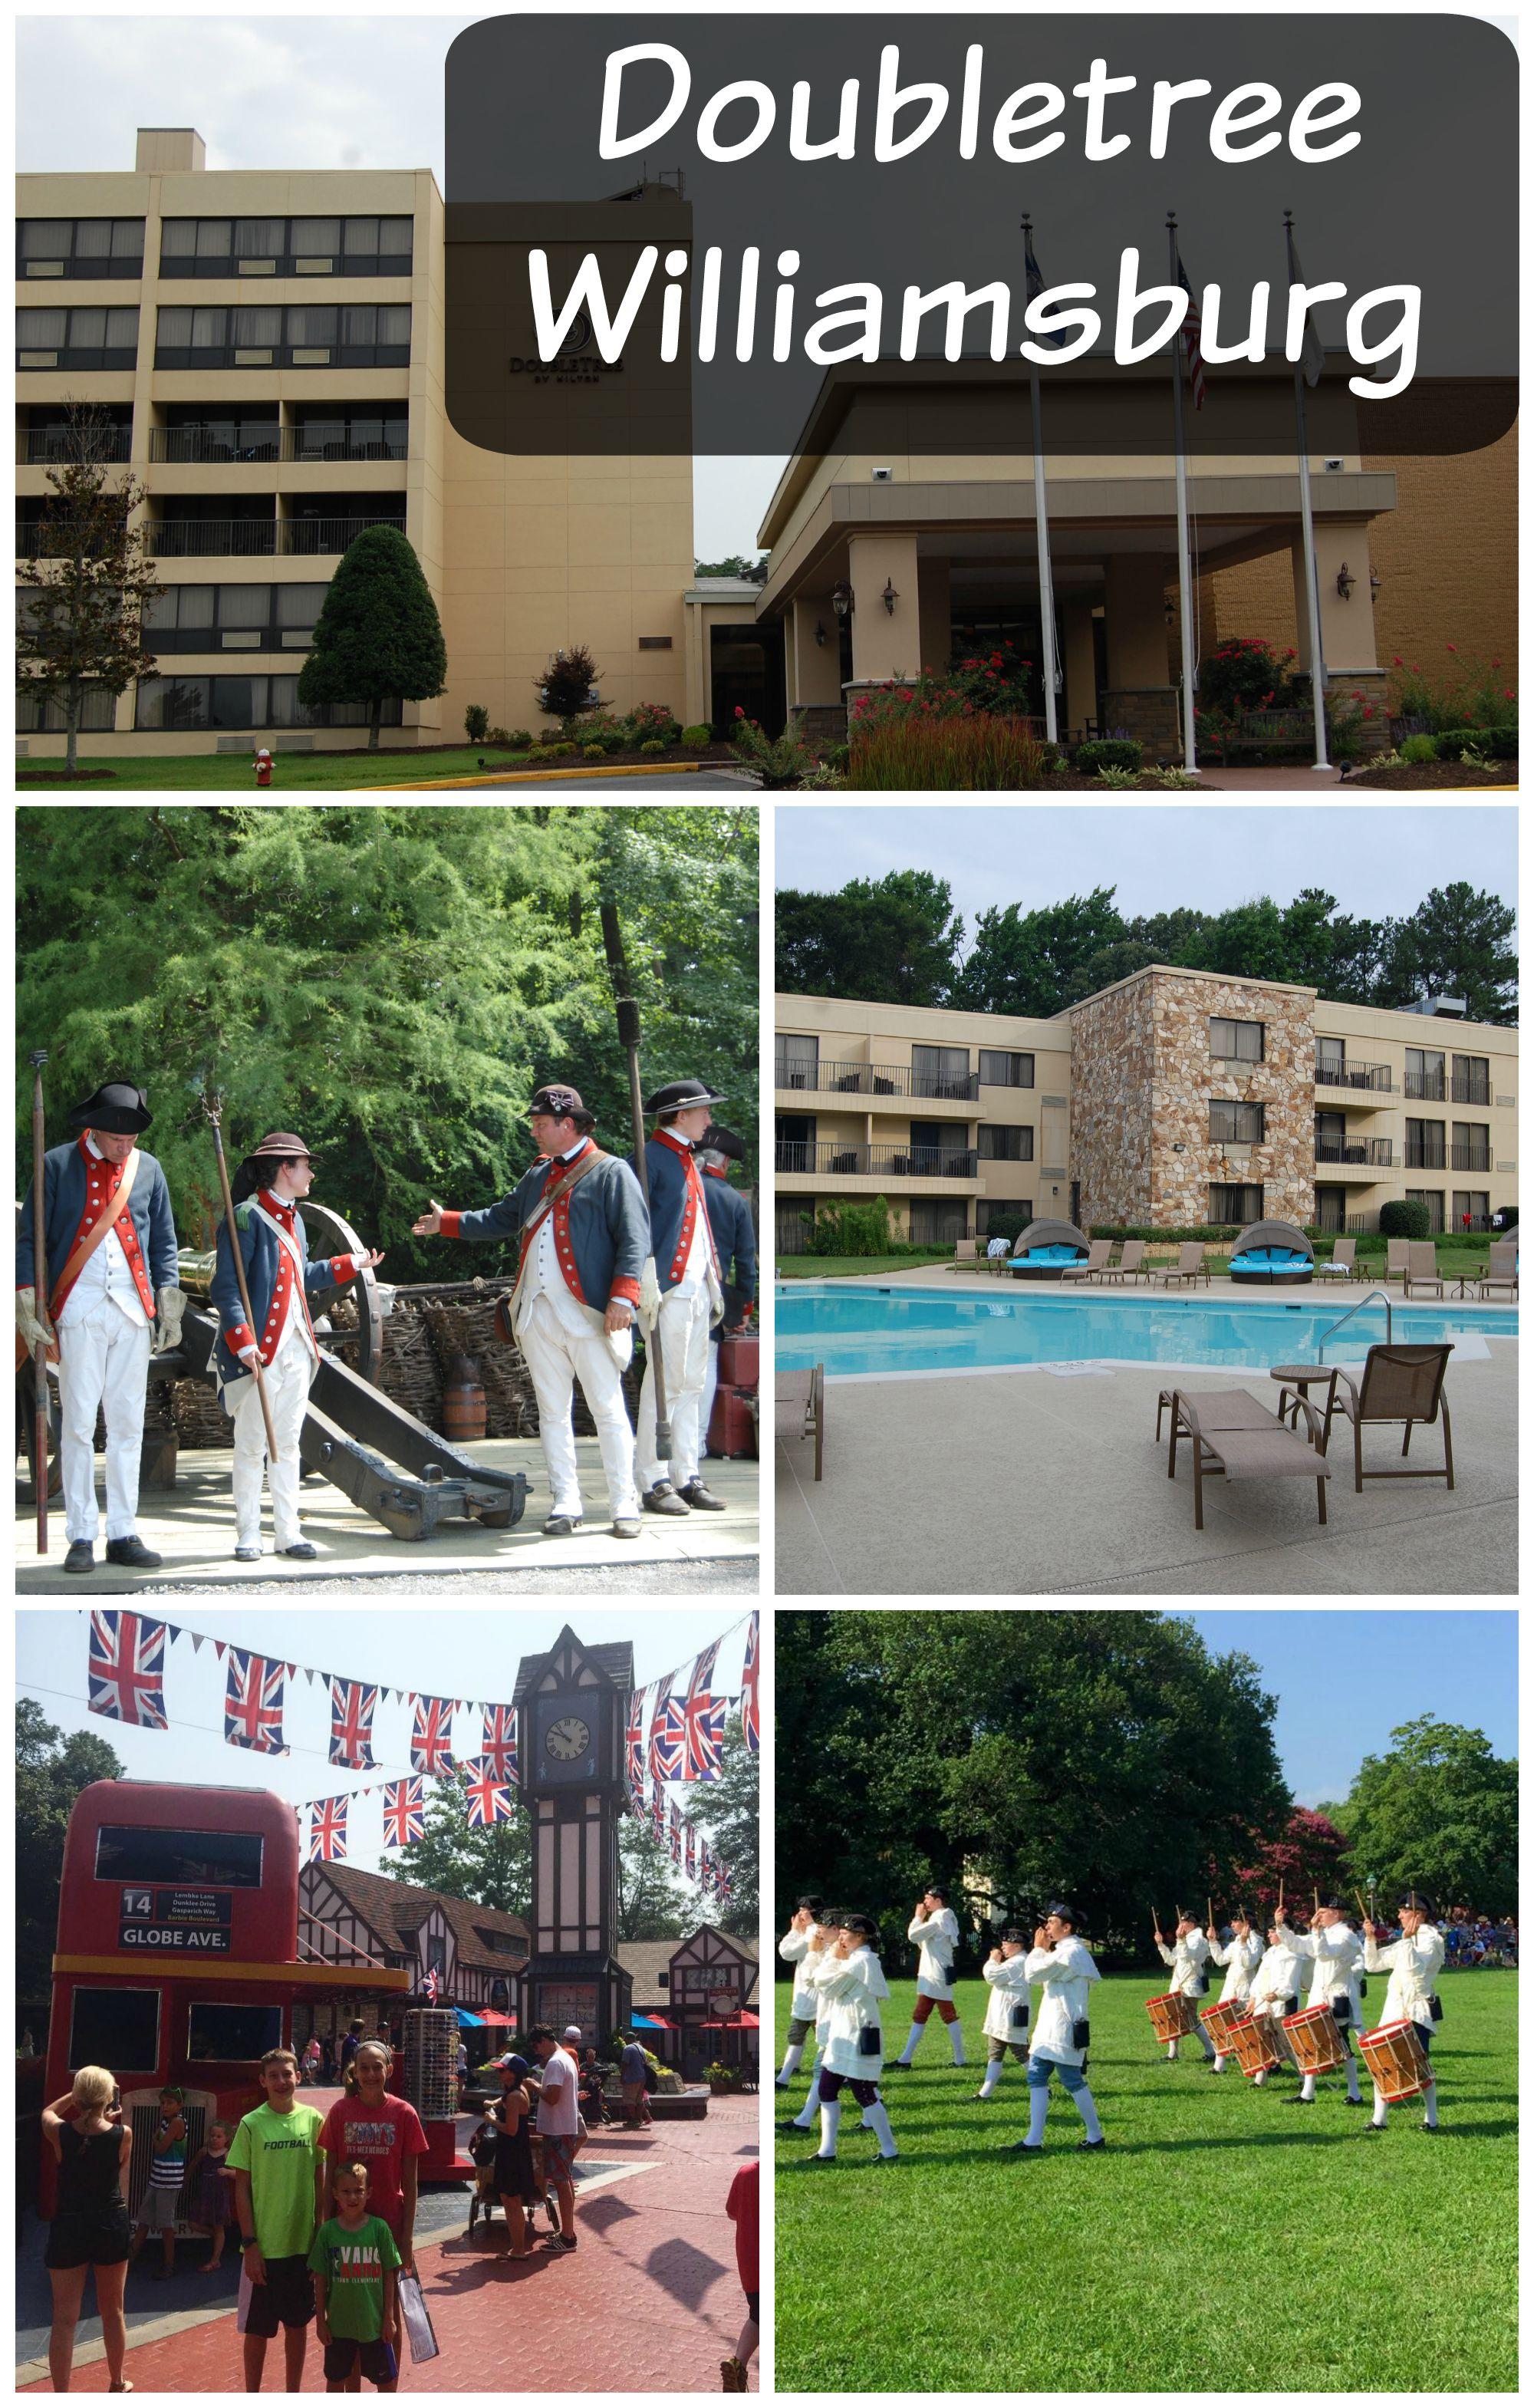 Hilton hotels in williamsburg va near busch gardens - Williamsburg va hotels near busch gardens ...